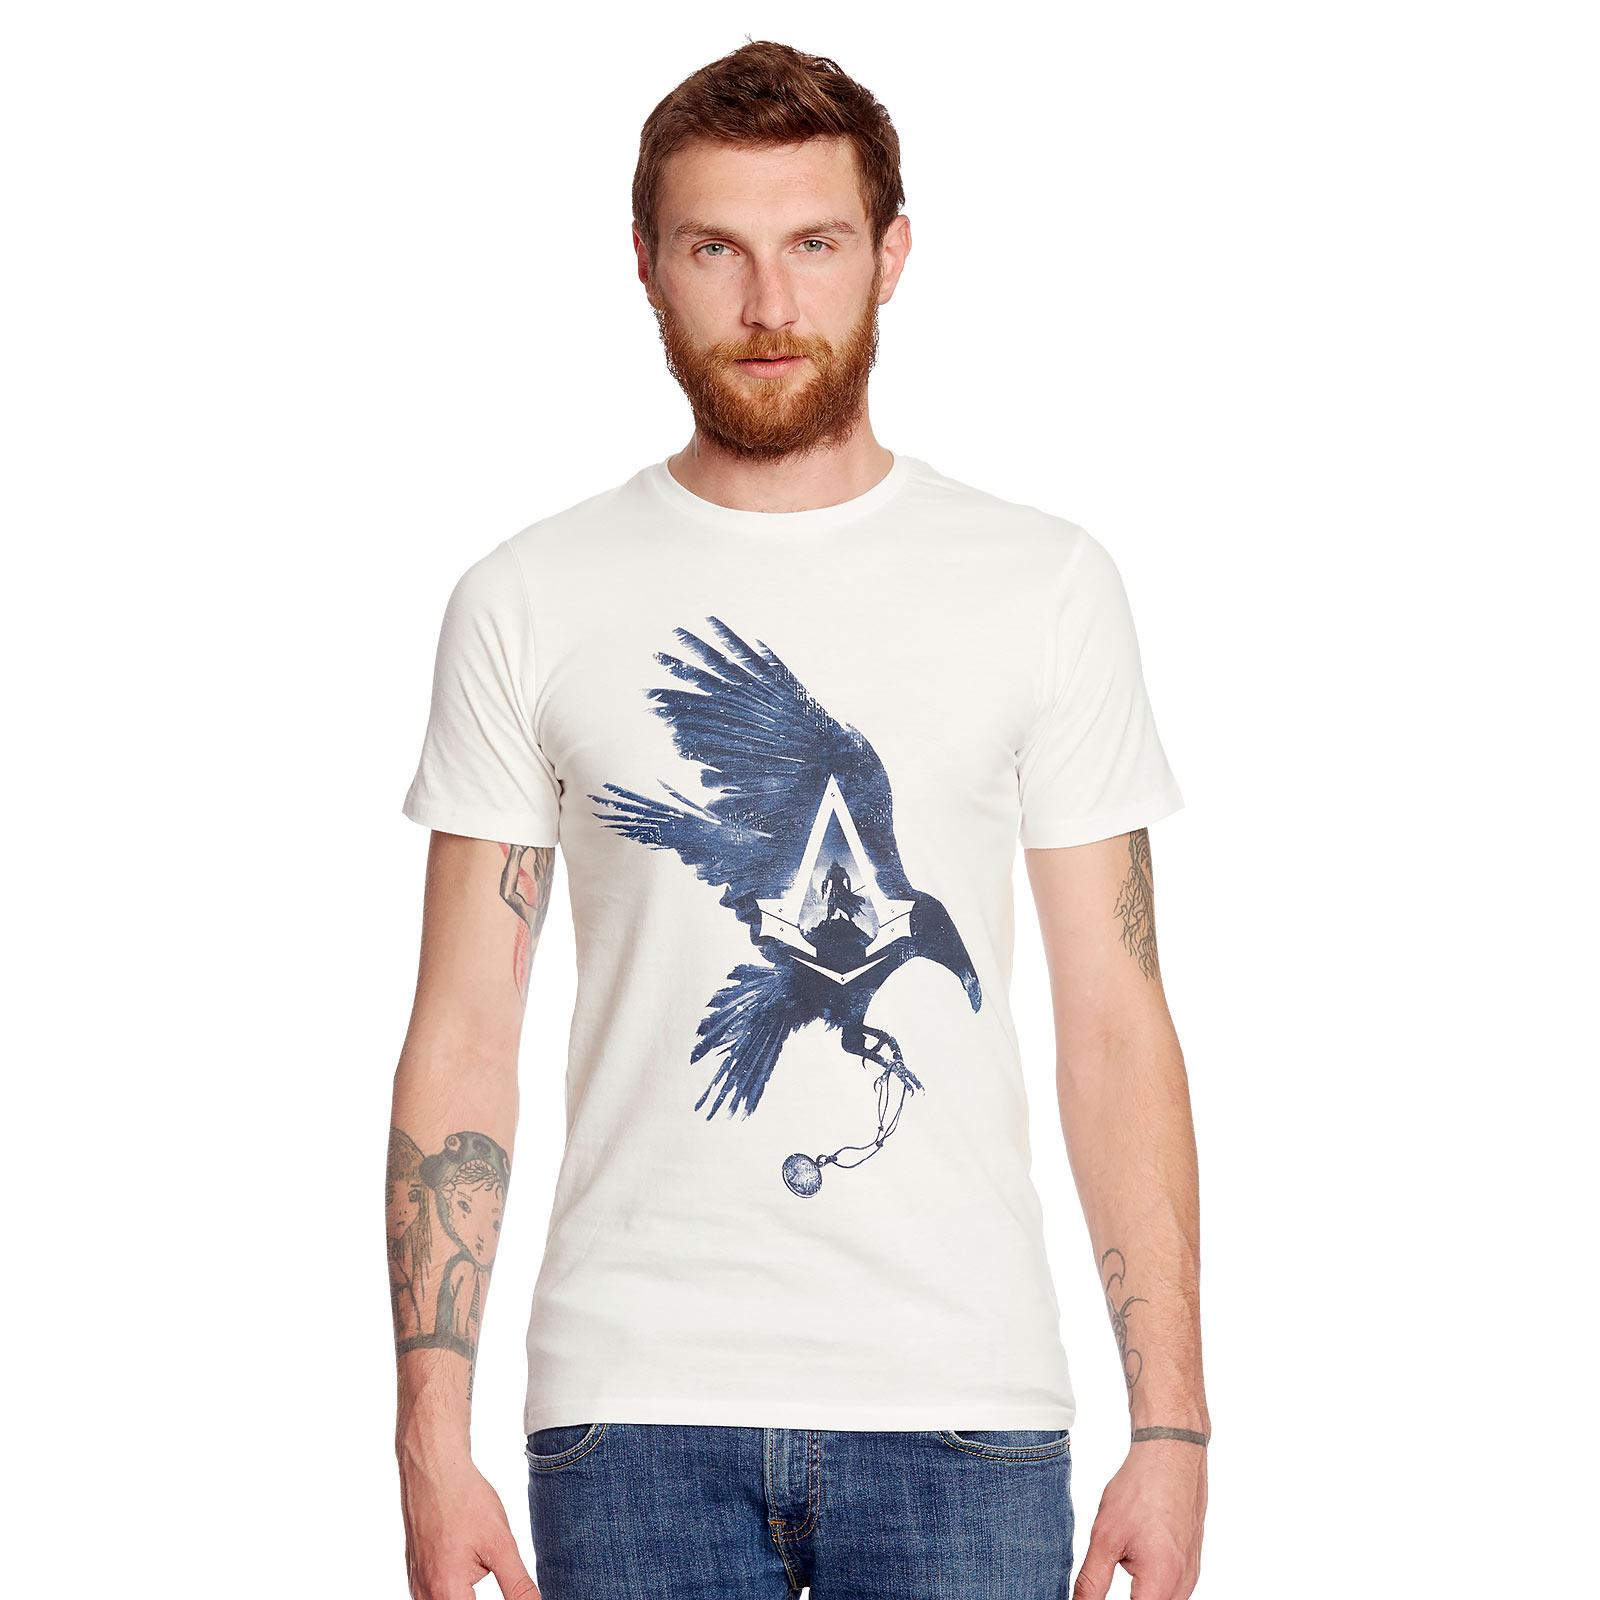 Assassins Creed - Jacob Frye Raven T-Shirt weiß